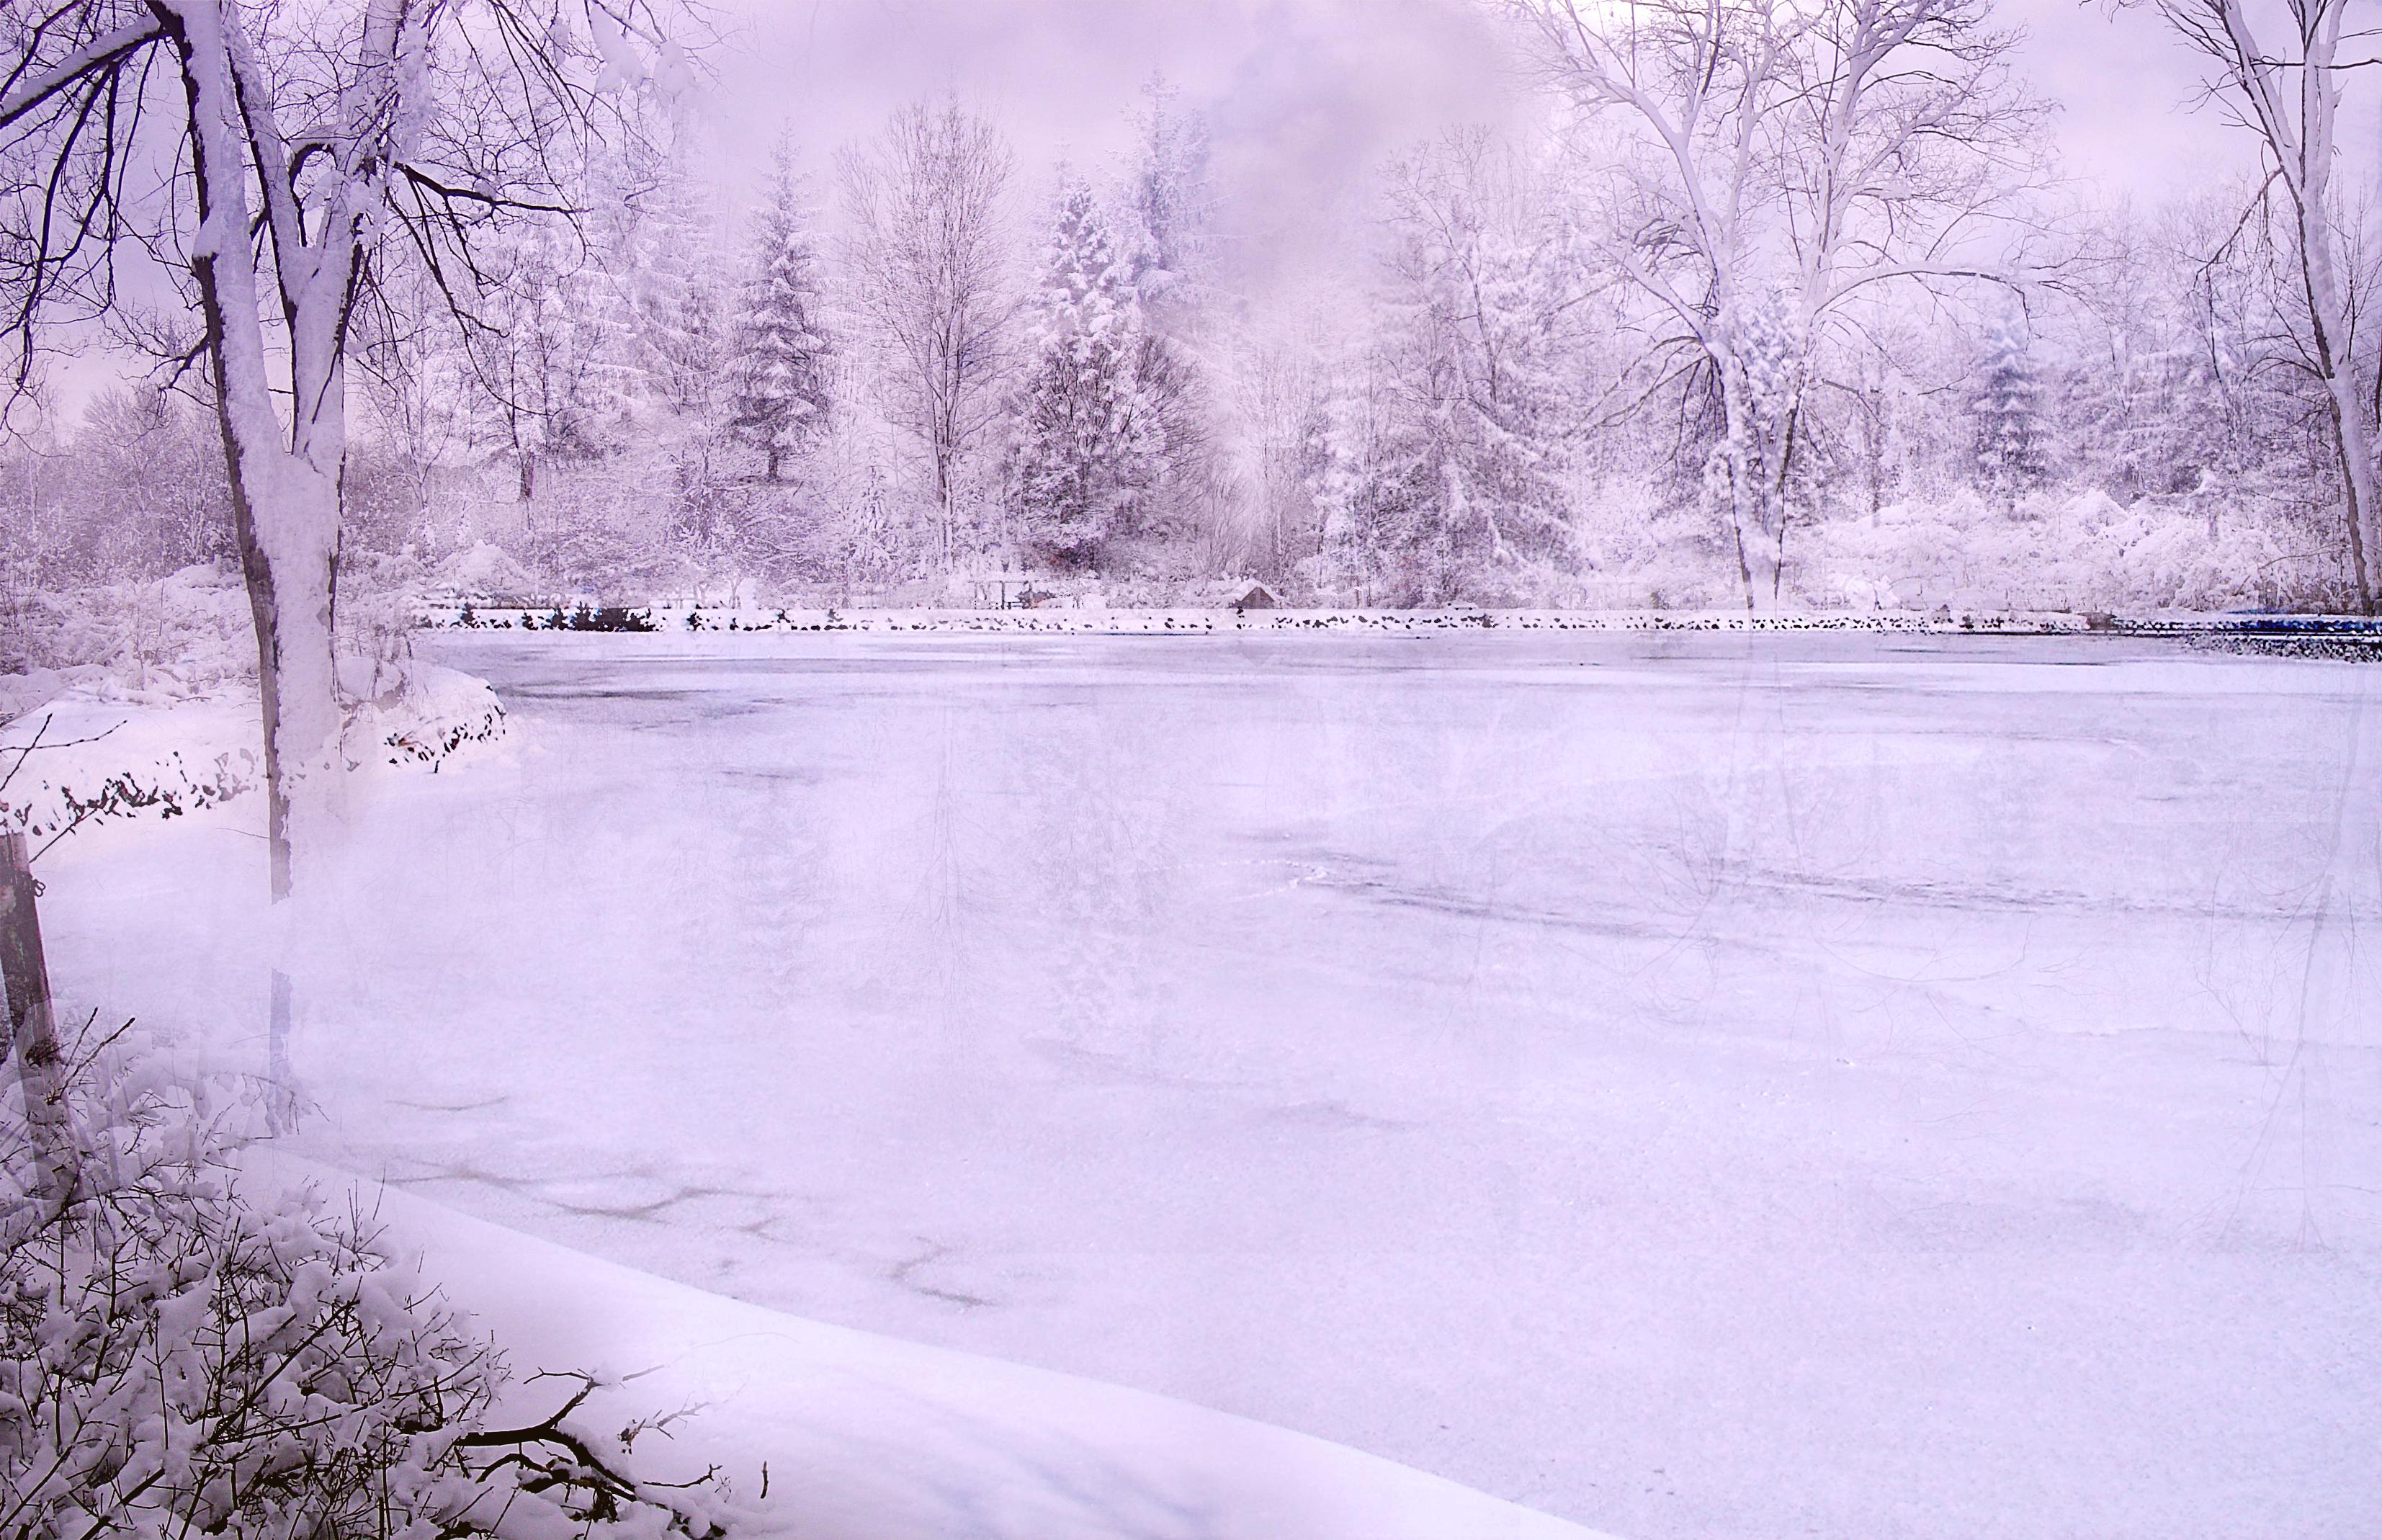 Winterlandscapebackgroundbyleina Djnfm